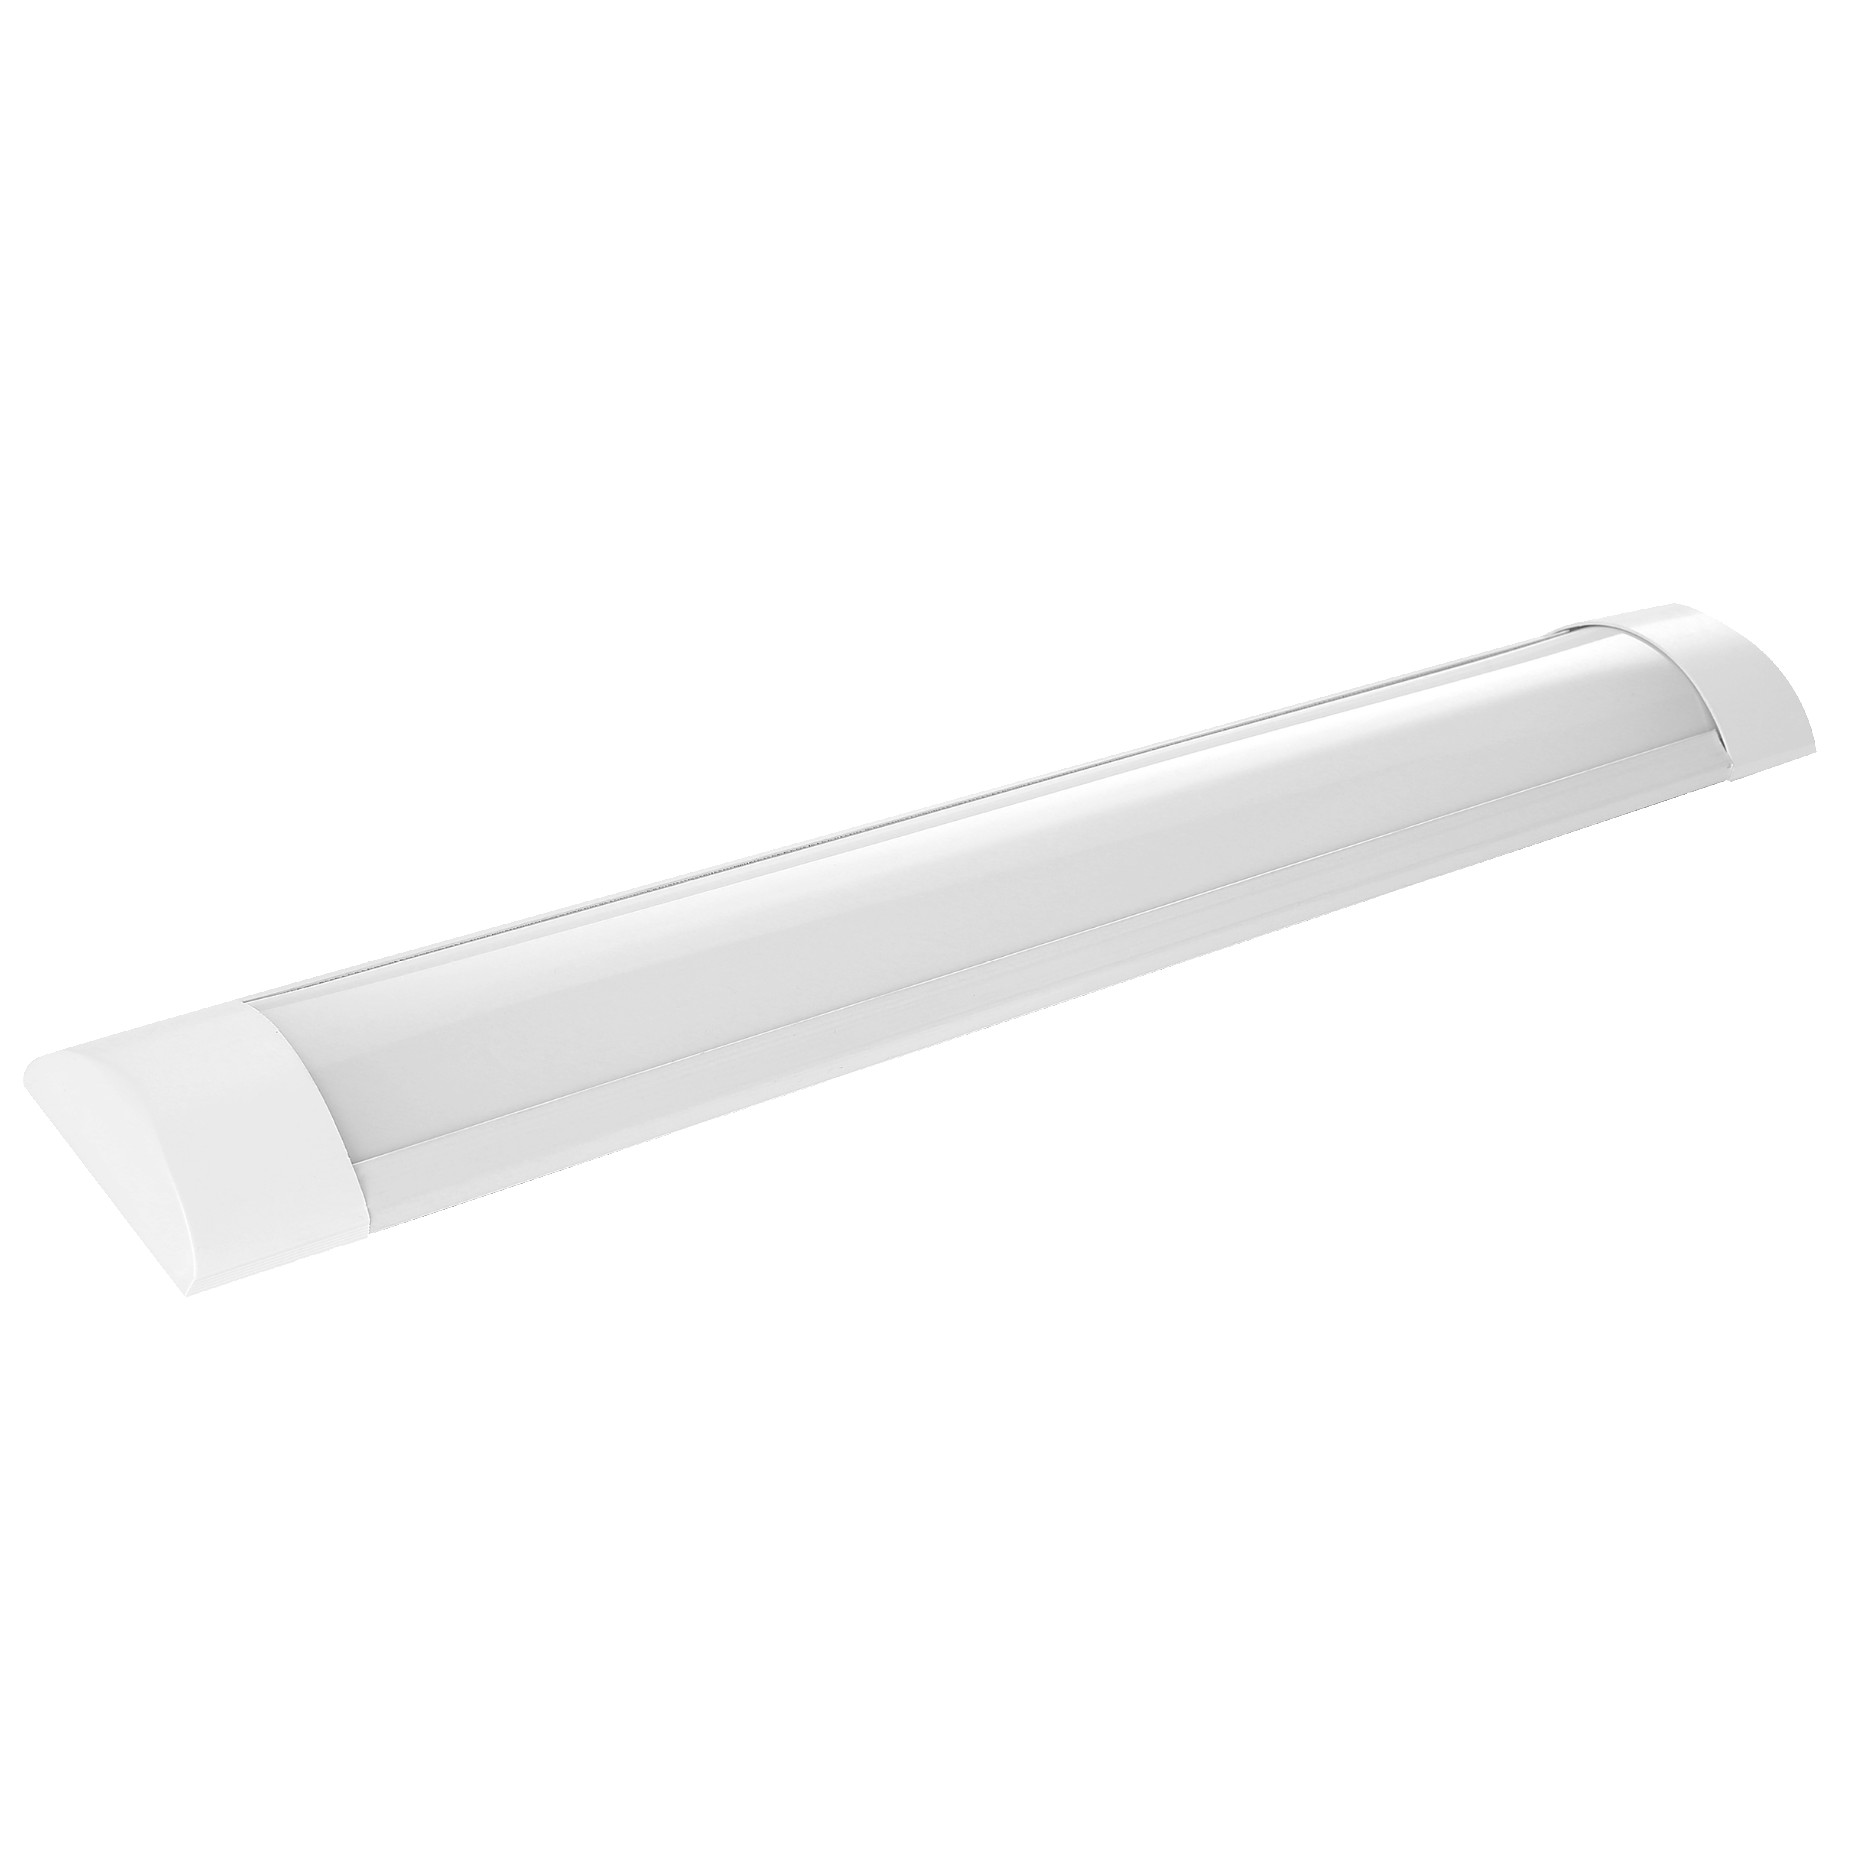 Luminaria LED Elegance Slim de Sobrepor 36W Luz Branca - Avant